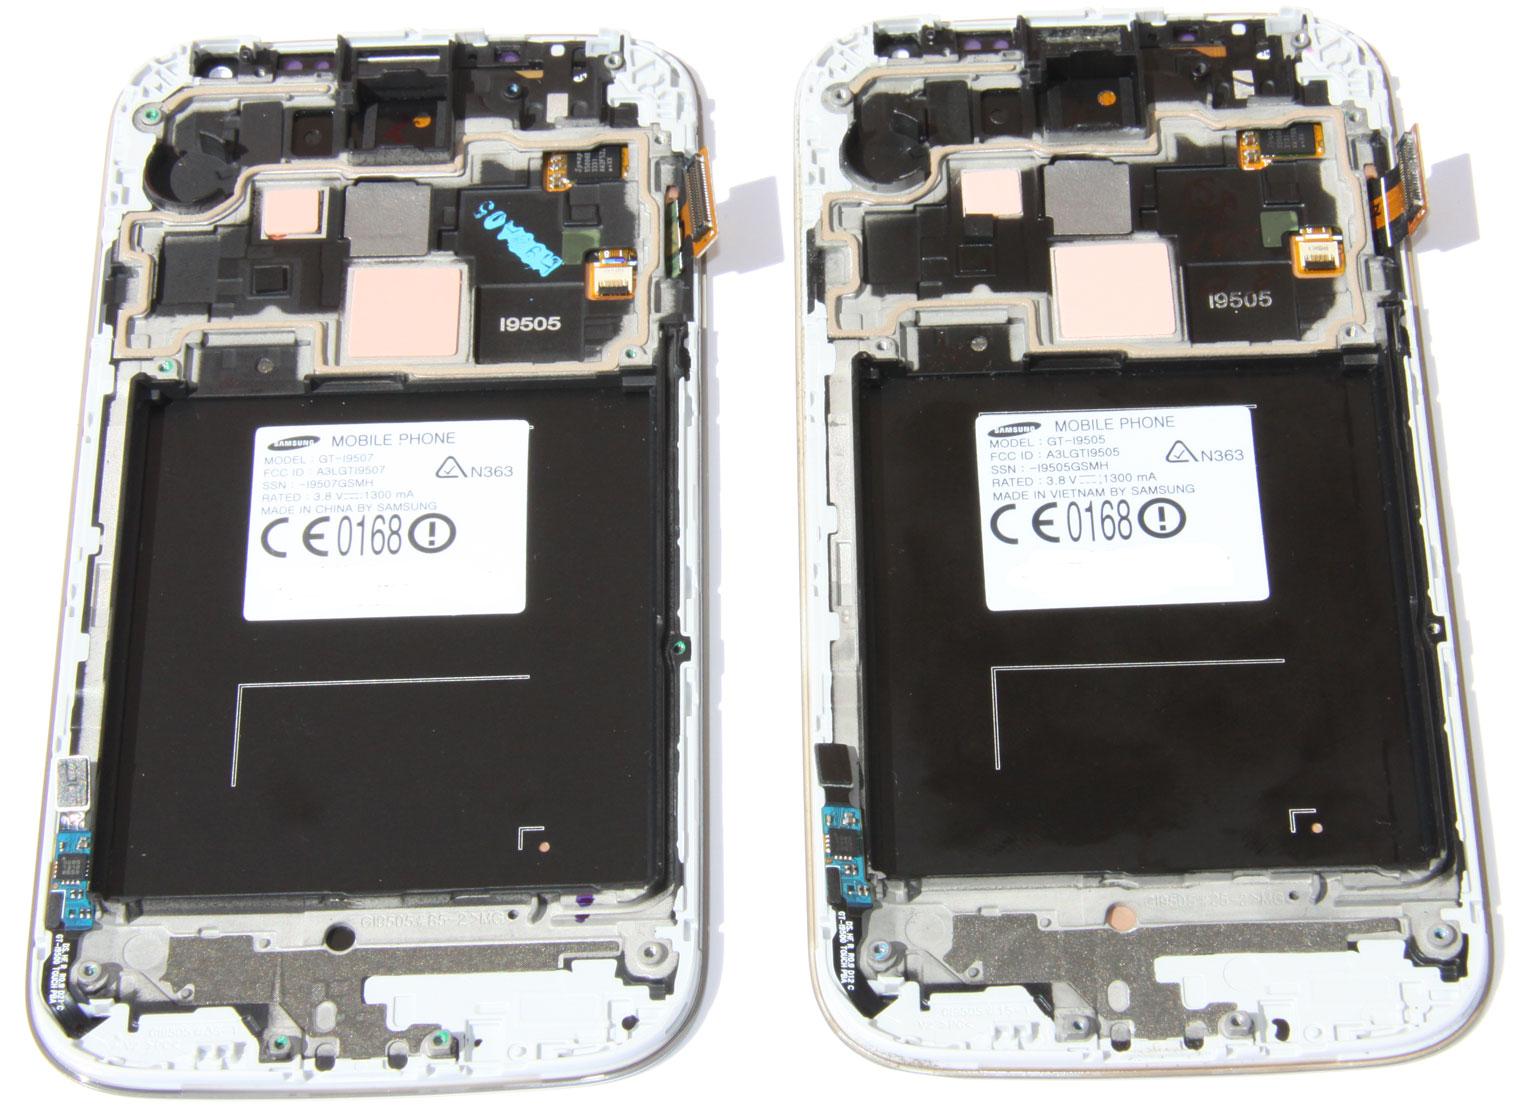 Samsung Galaxy S4 4g I9507 Vs I9505 Comparison I9500 New All Black Comparing The Screens For